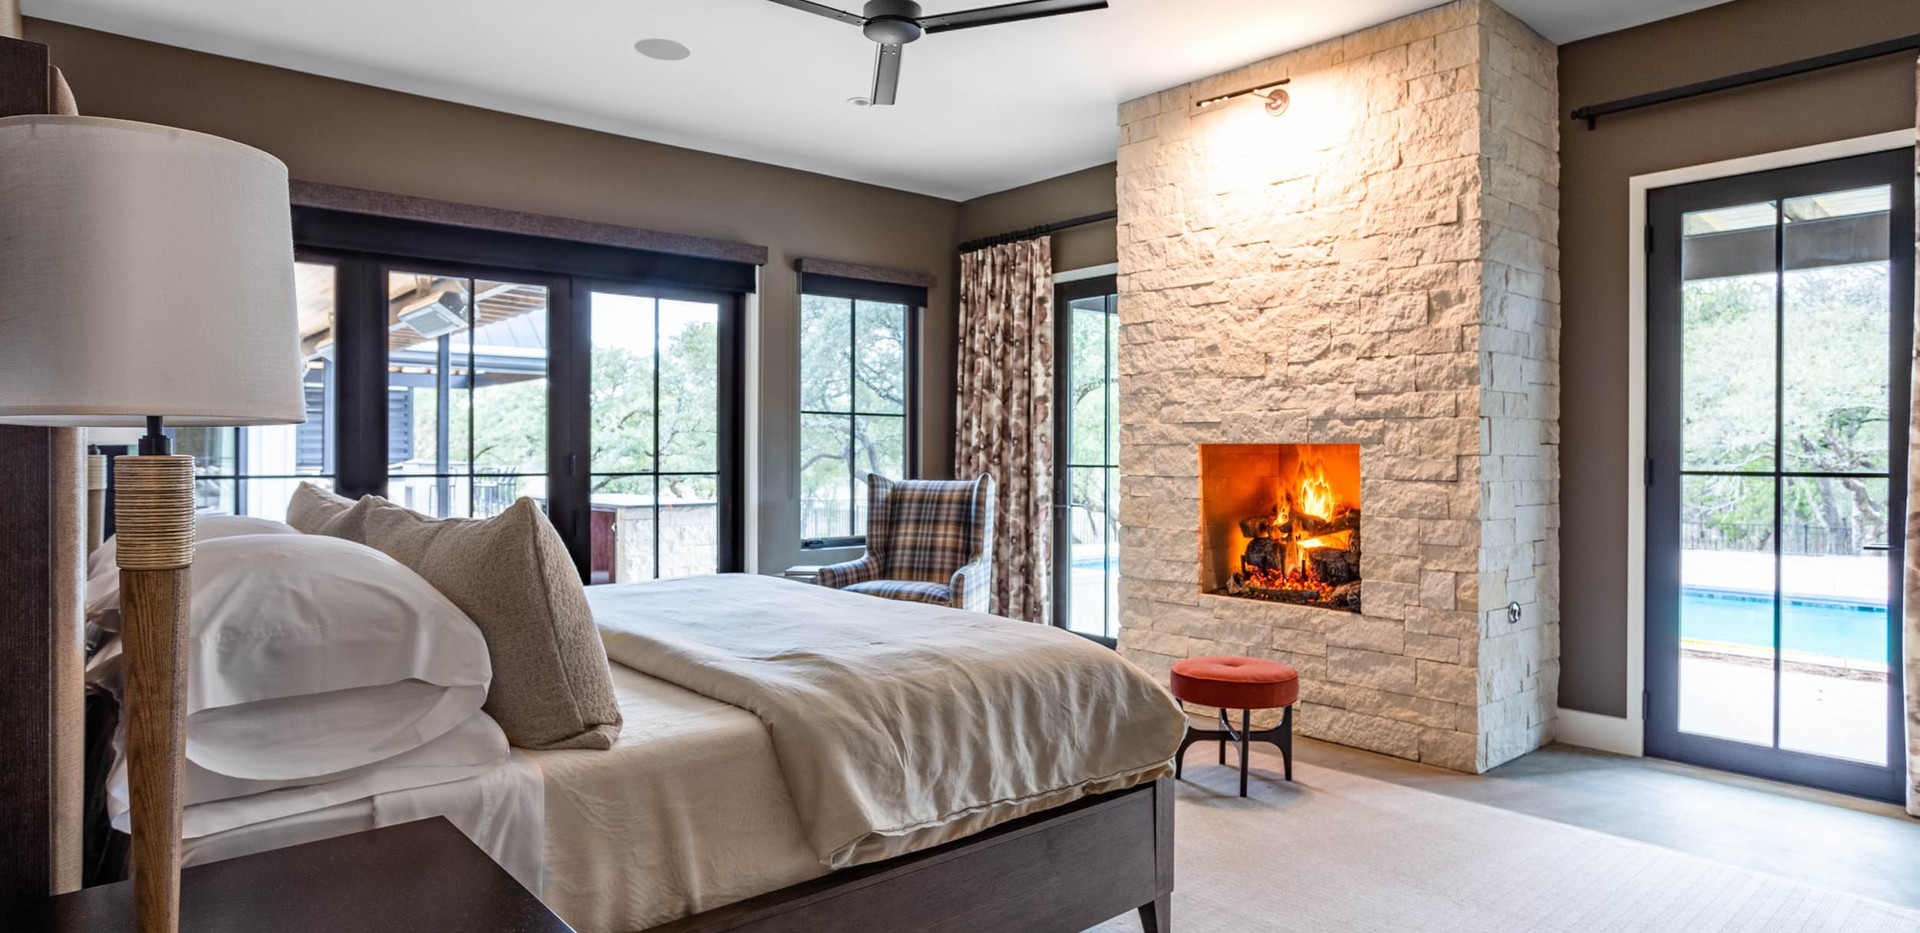 Contemporar farmhouse Master Suite